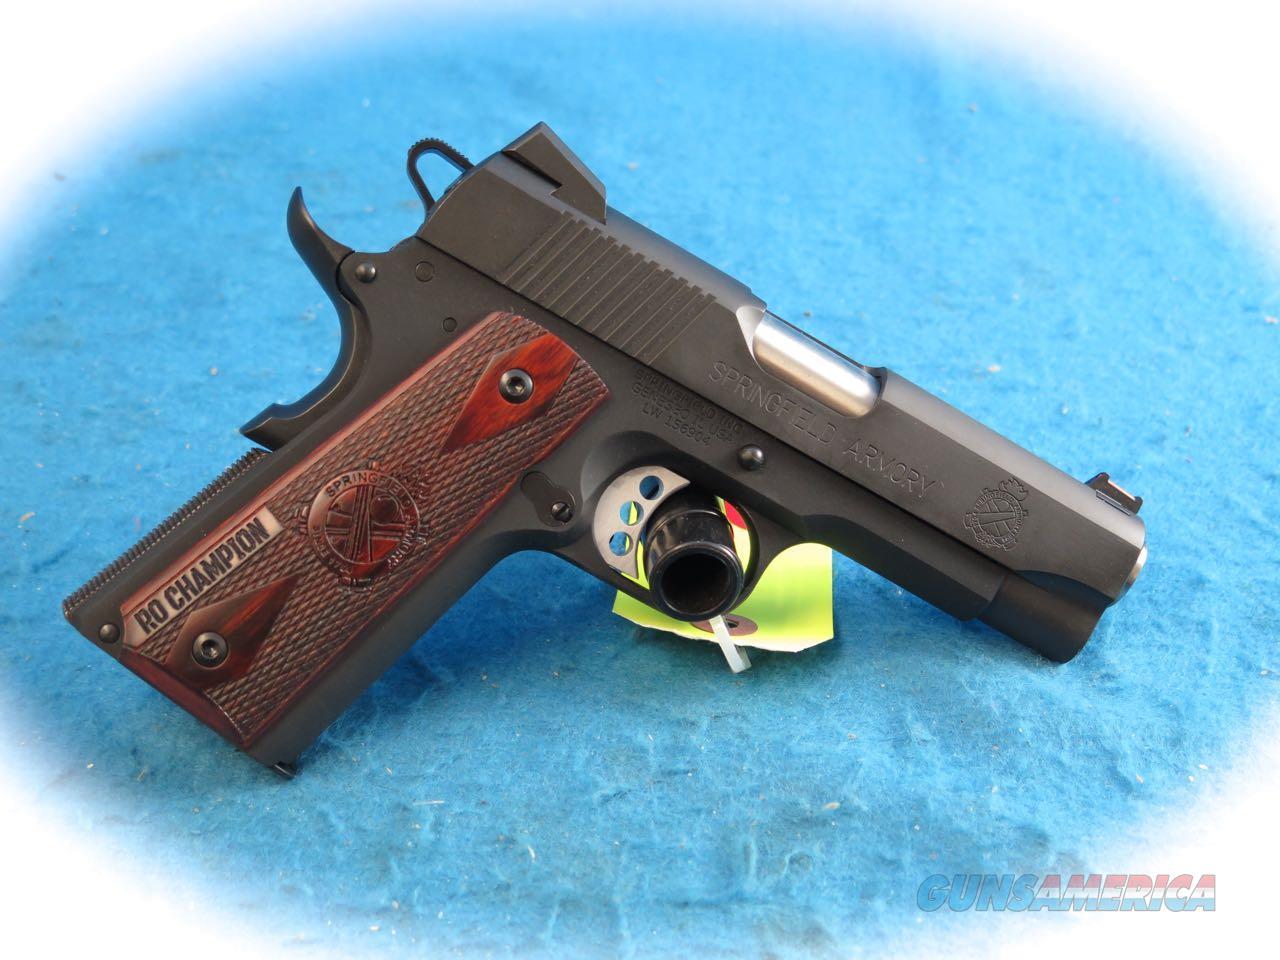 Springfield Armory 1911 Range Officer Champion .45 ACP Pistol Model PI9136L **New**  Guns > Pistols > Springfield Armory Pistols > 1911 Type